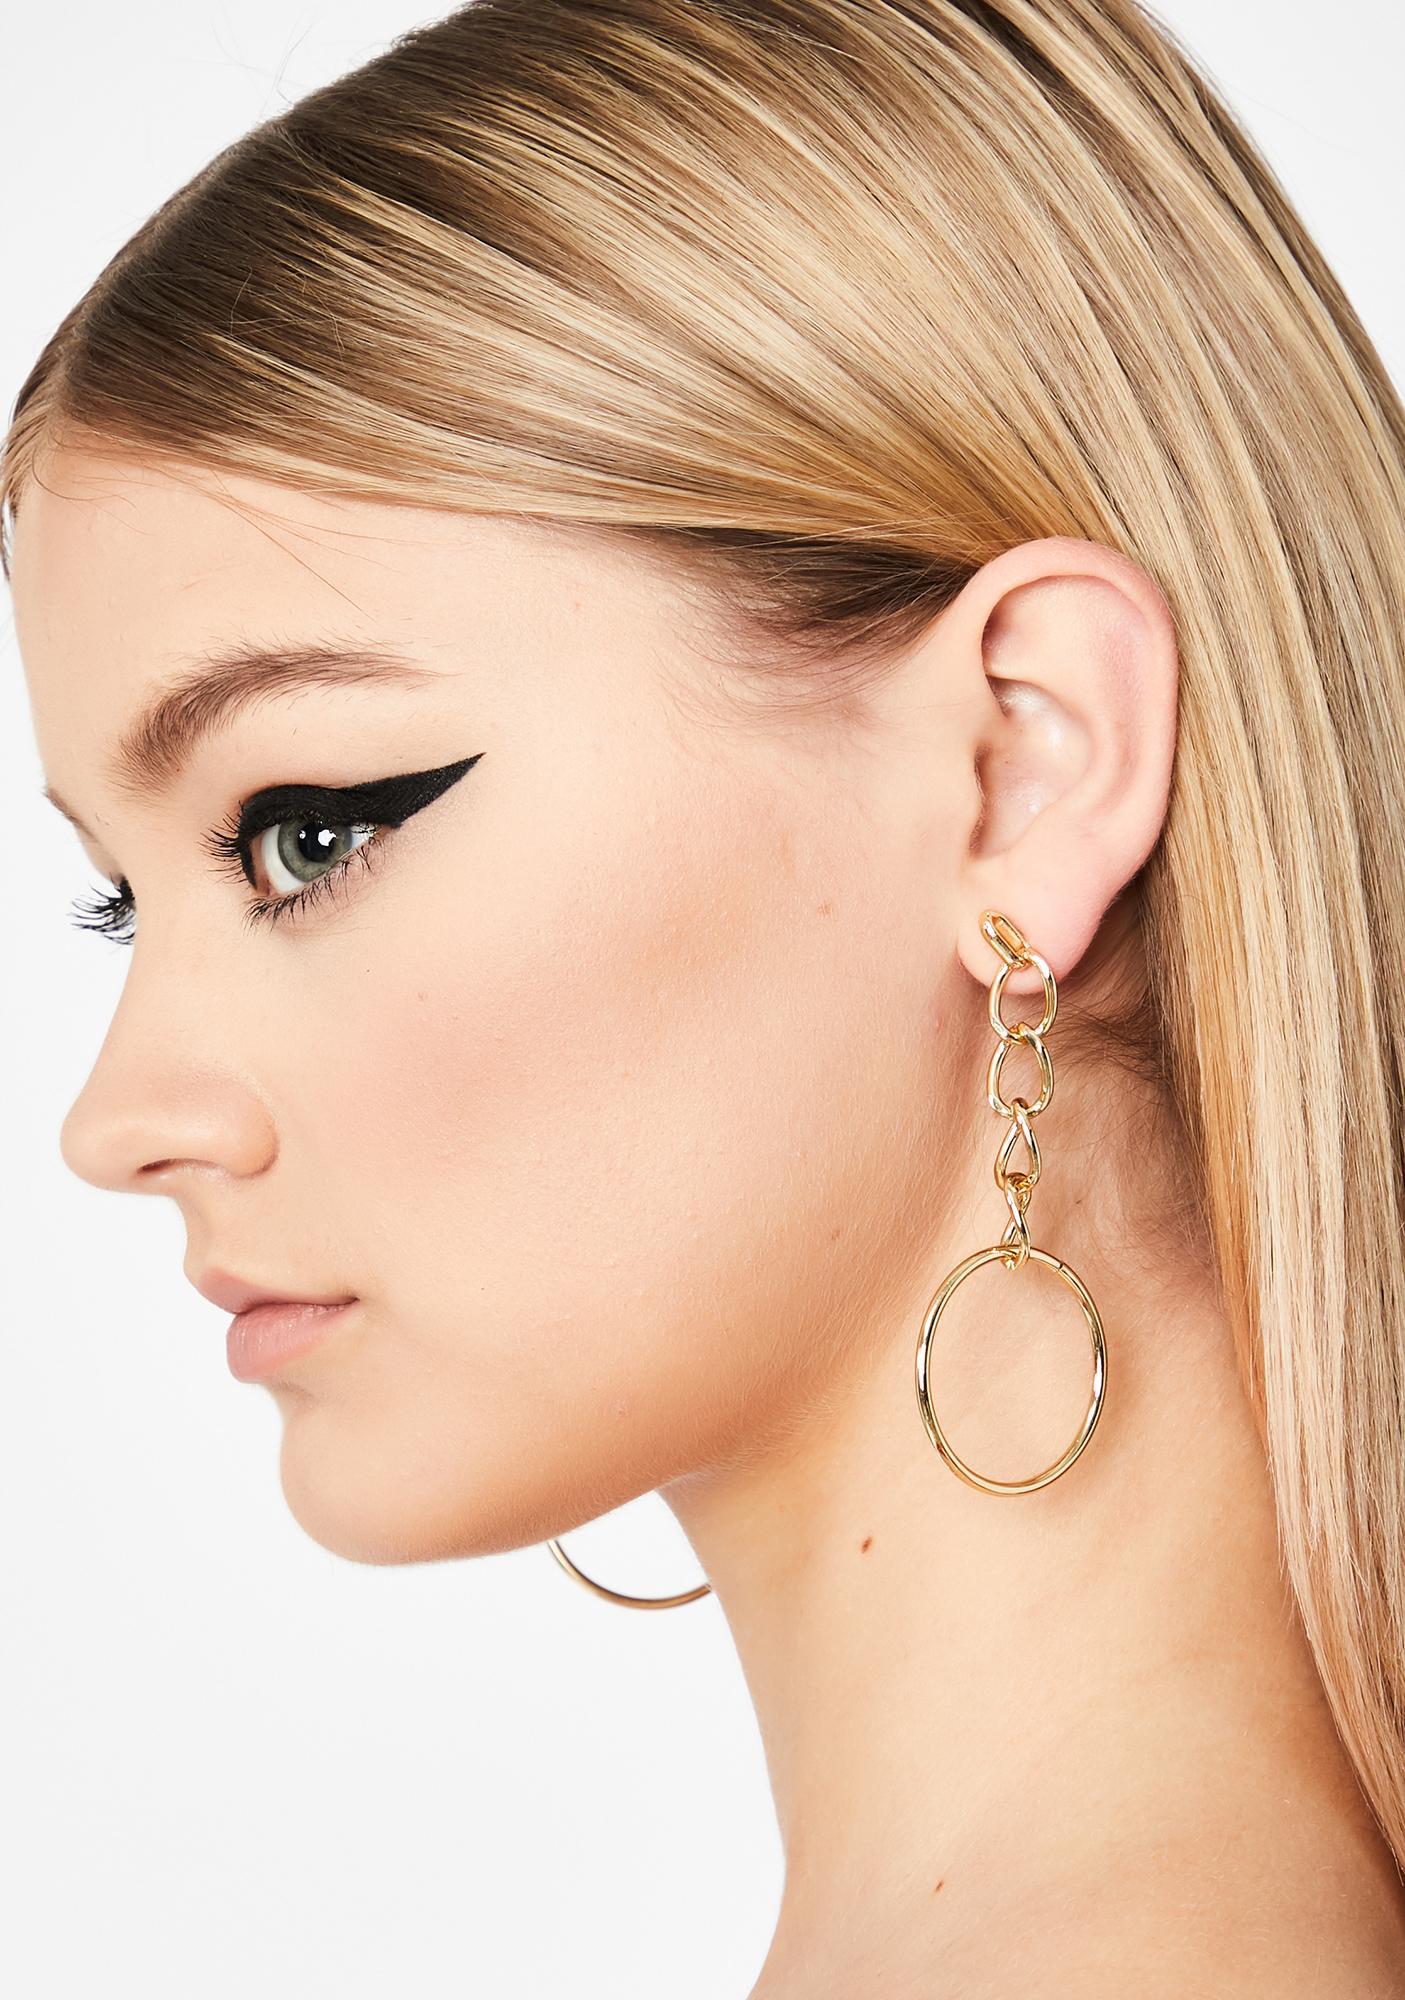 Hangin' Around Chain Earrings